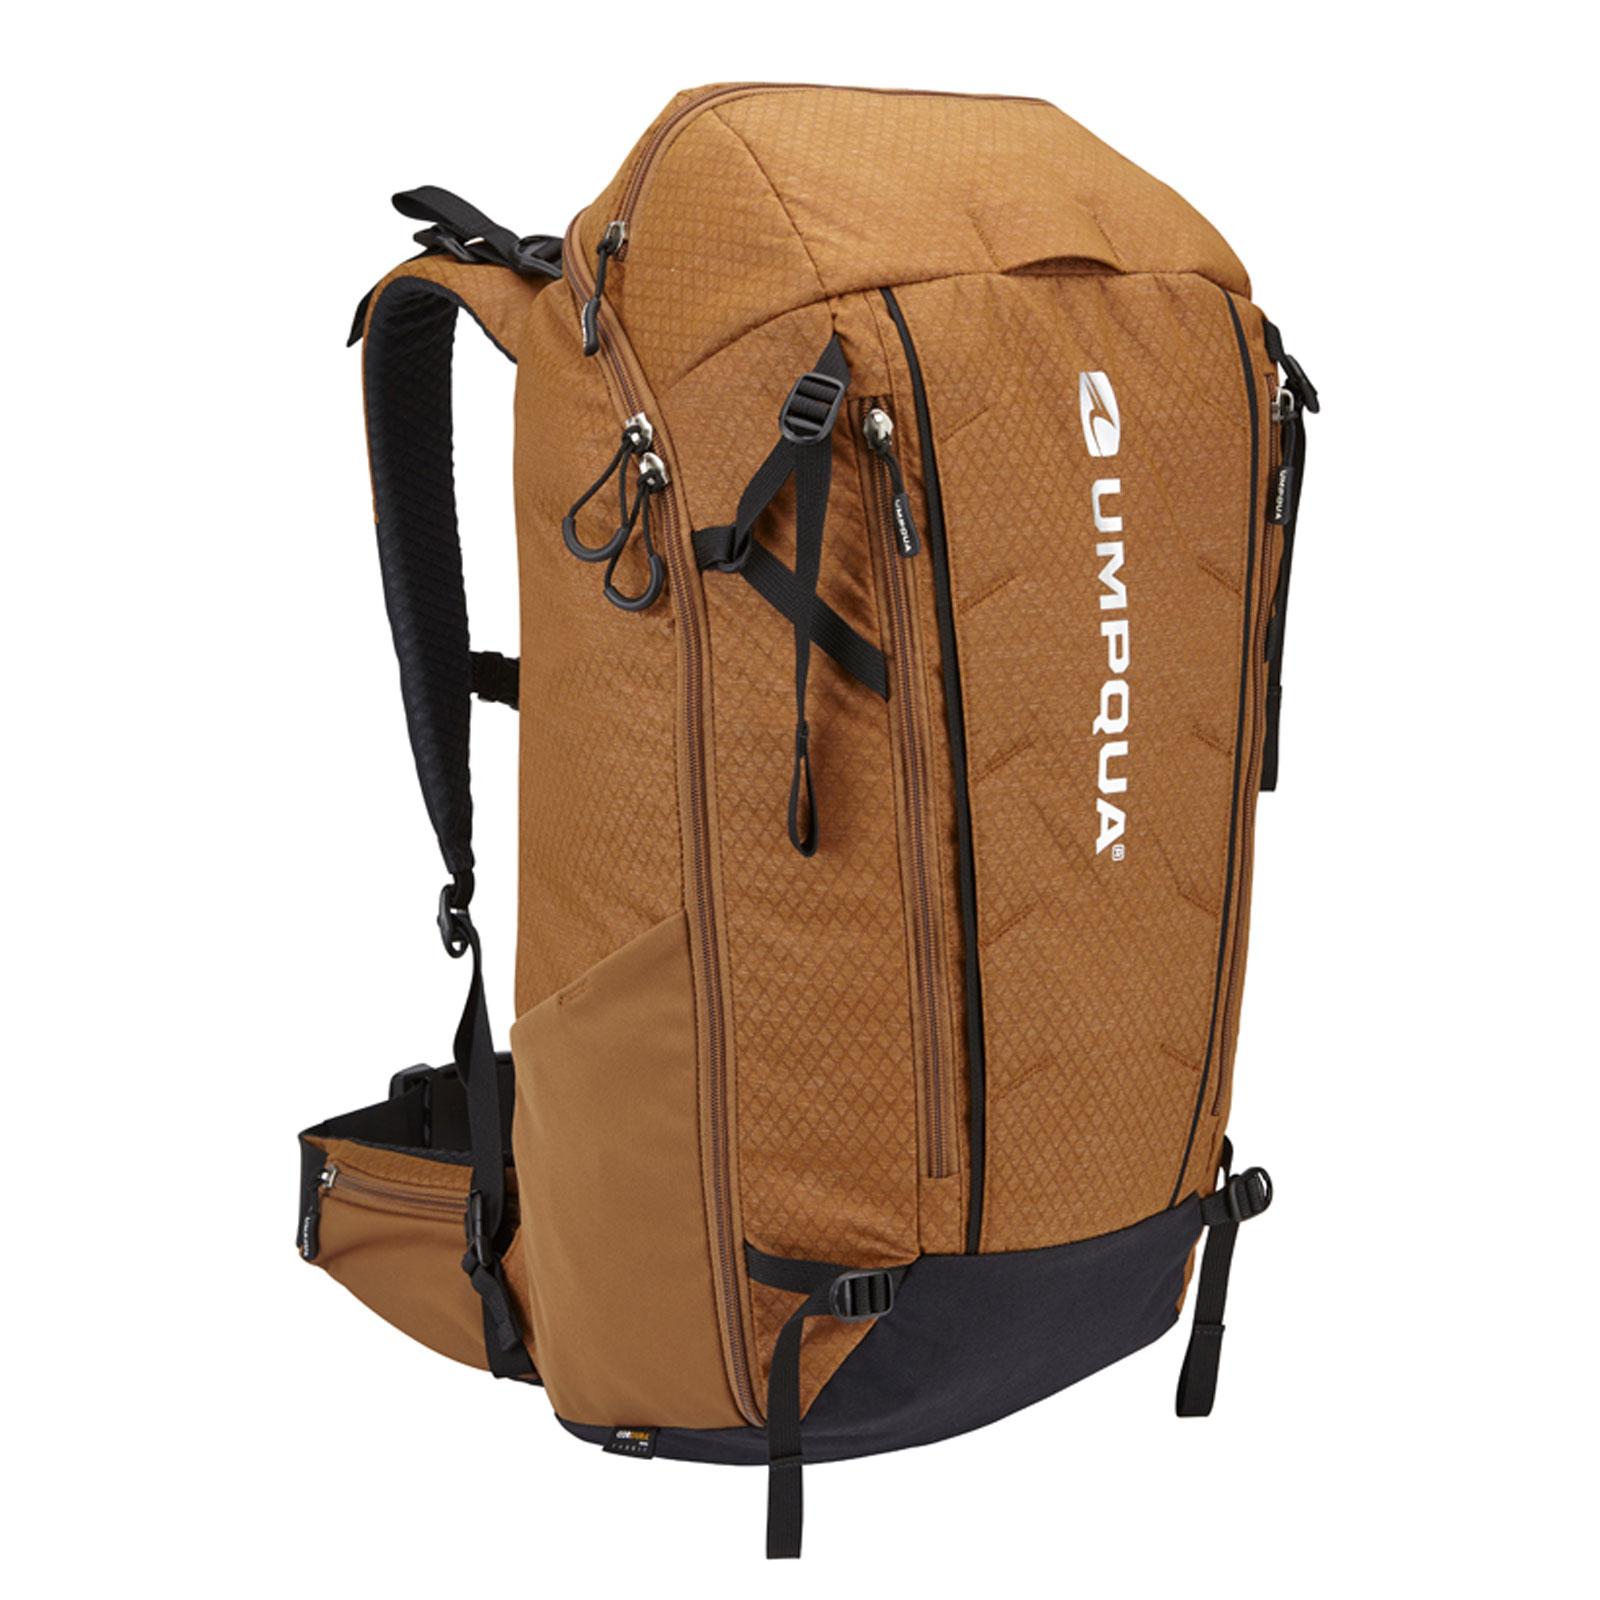 Umpqua surveyor 2000 zs zero sweep backpack fly fishing for Fly fishing gear